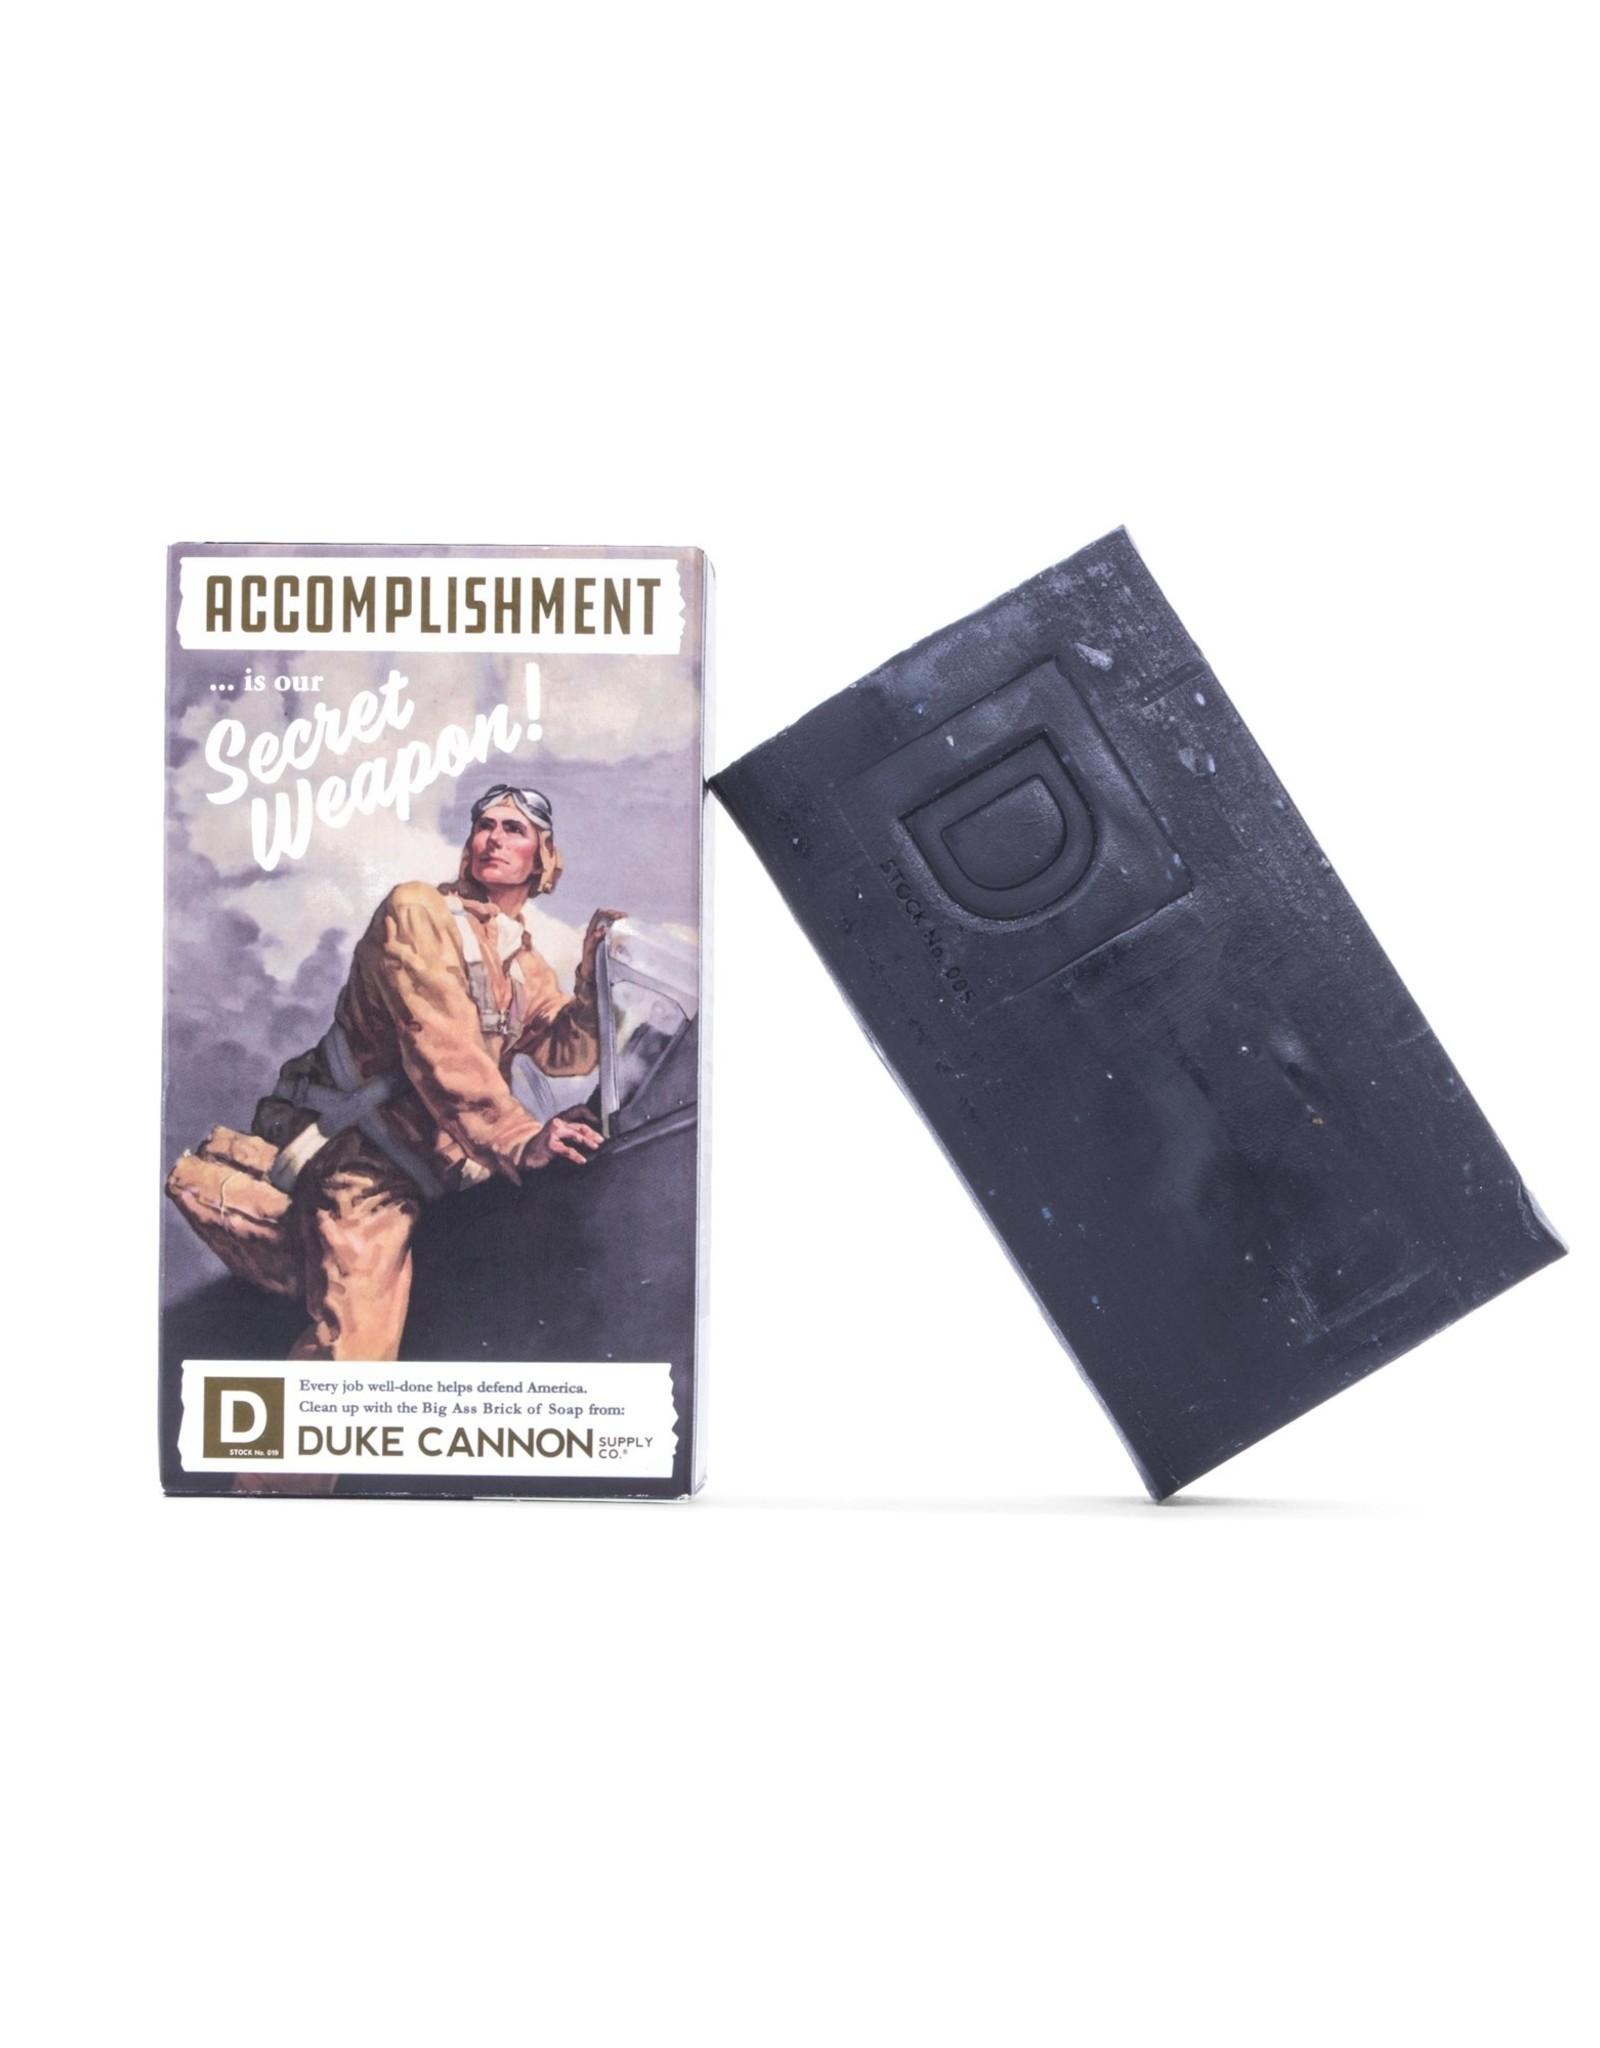 Duke Cannon Smells Like Accomplishment Soap